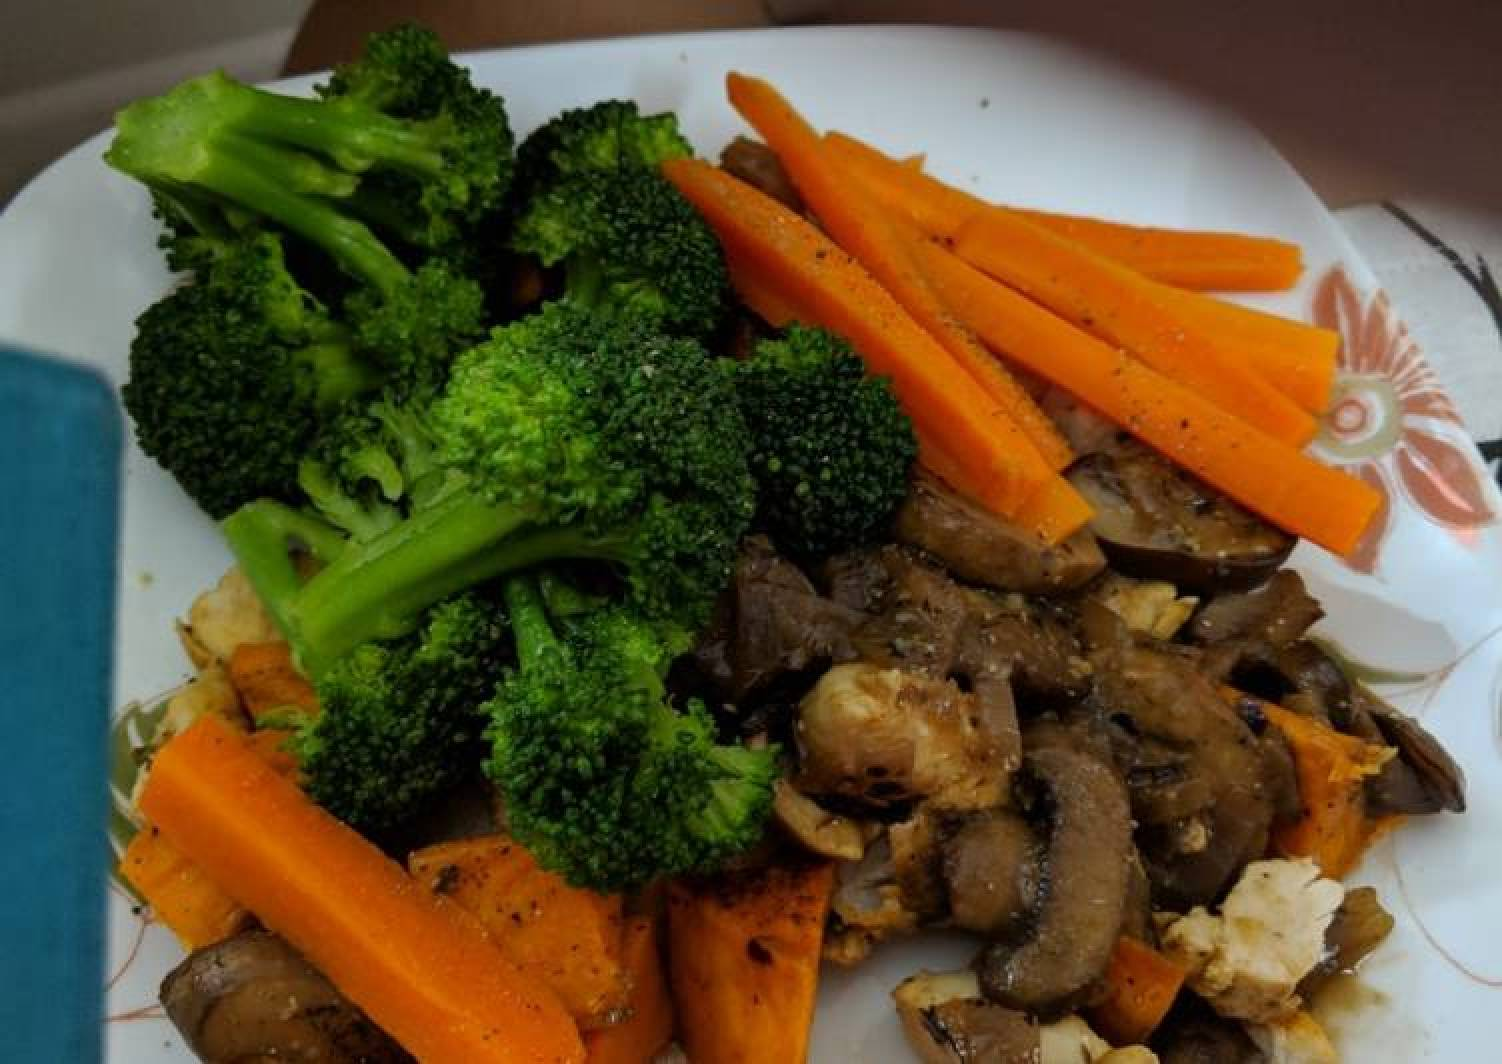 Steamed carrots broccoli over baked chicken in mushroom sauce